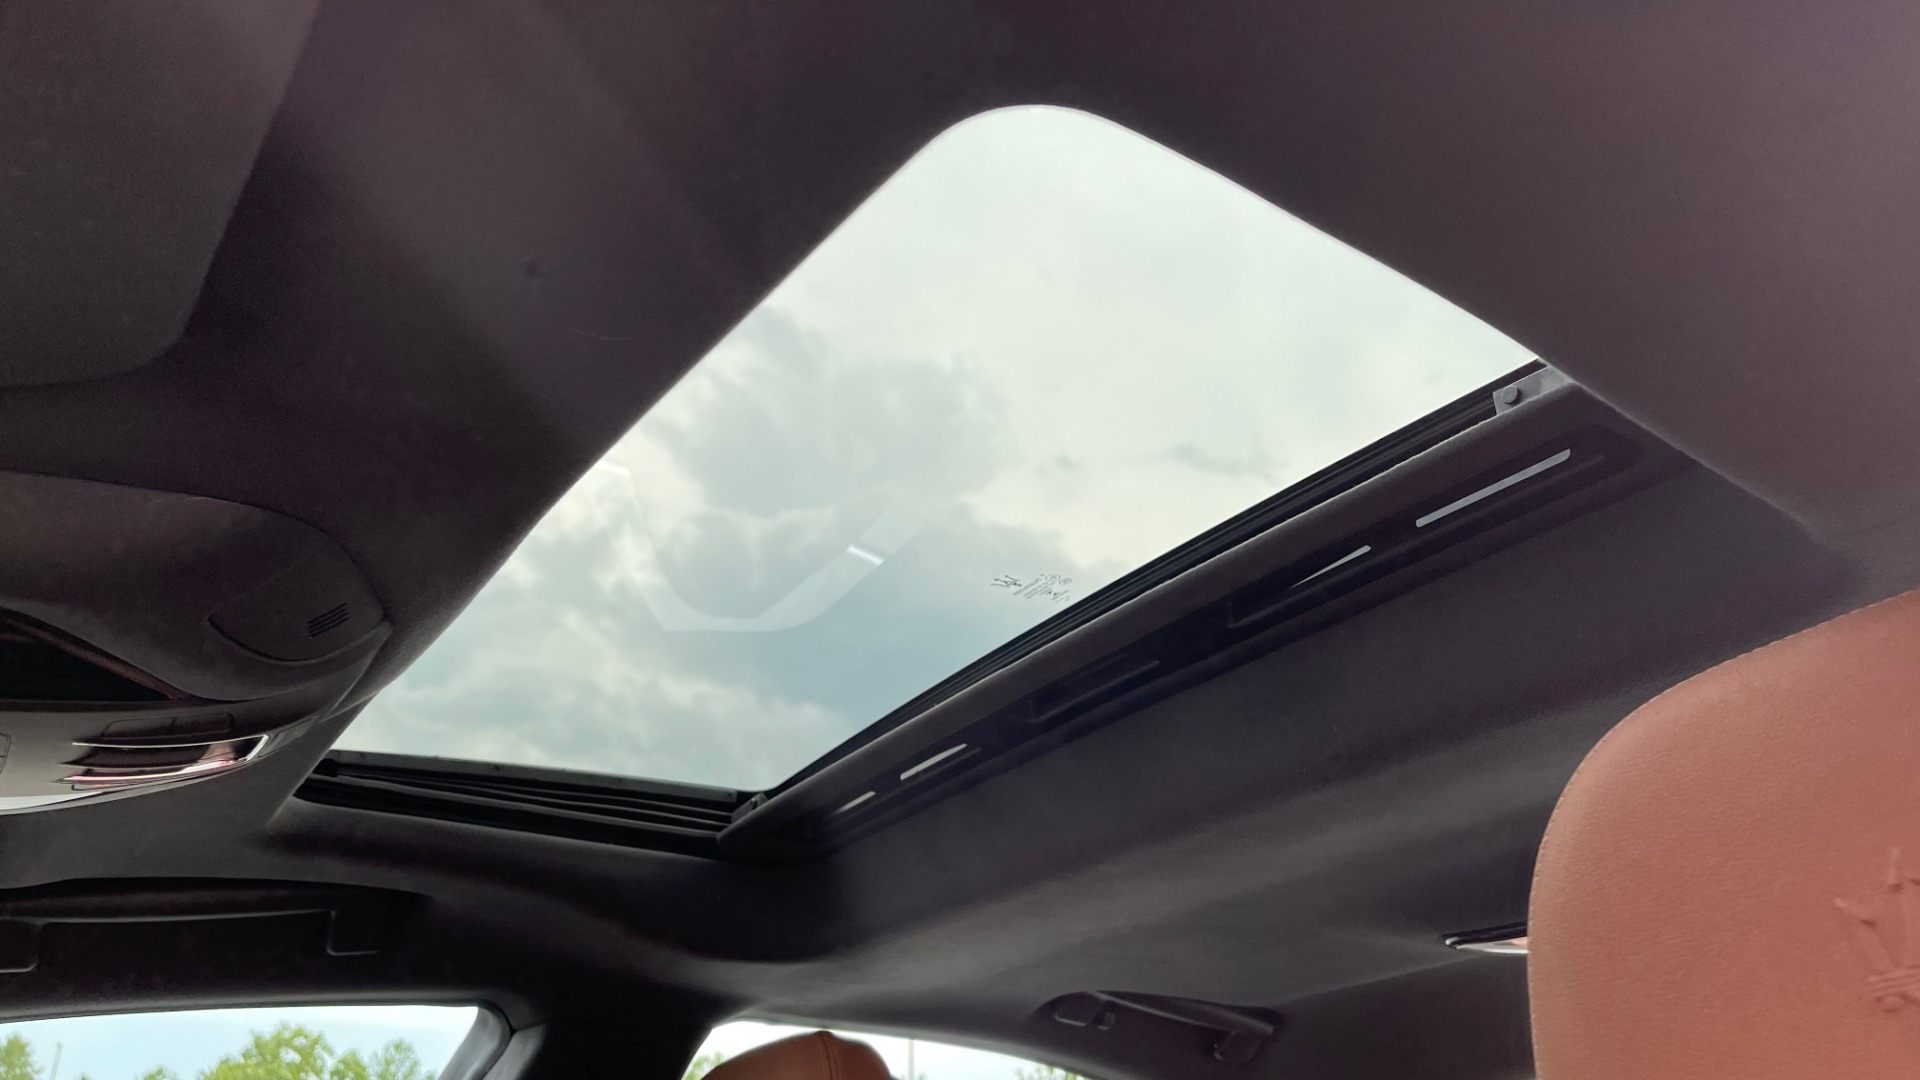 Used 2018 Maserati GHIBLI 3.0L SEDAN / 8-SPD AUTO / NAV / SUNROOF / REARVIEW for sale $42,995 at Formula Imports in Charlotte NC 28227 45